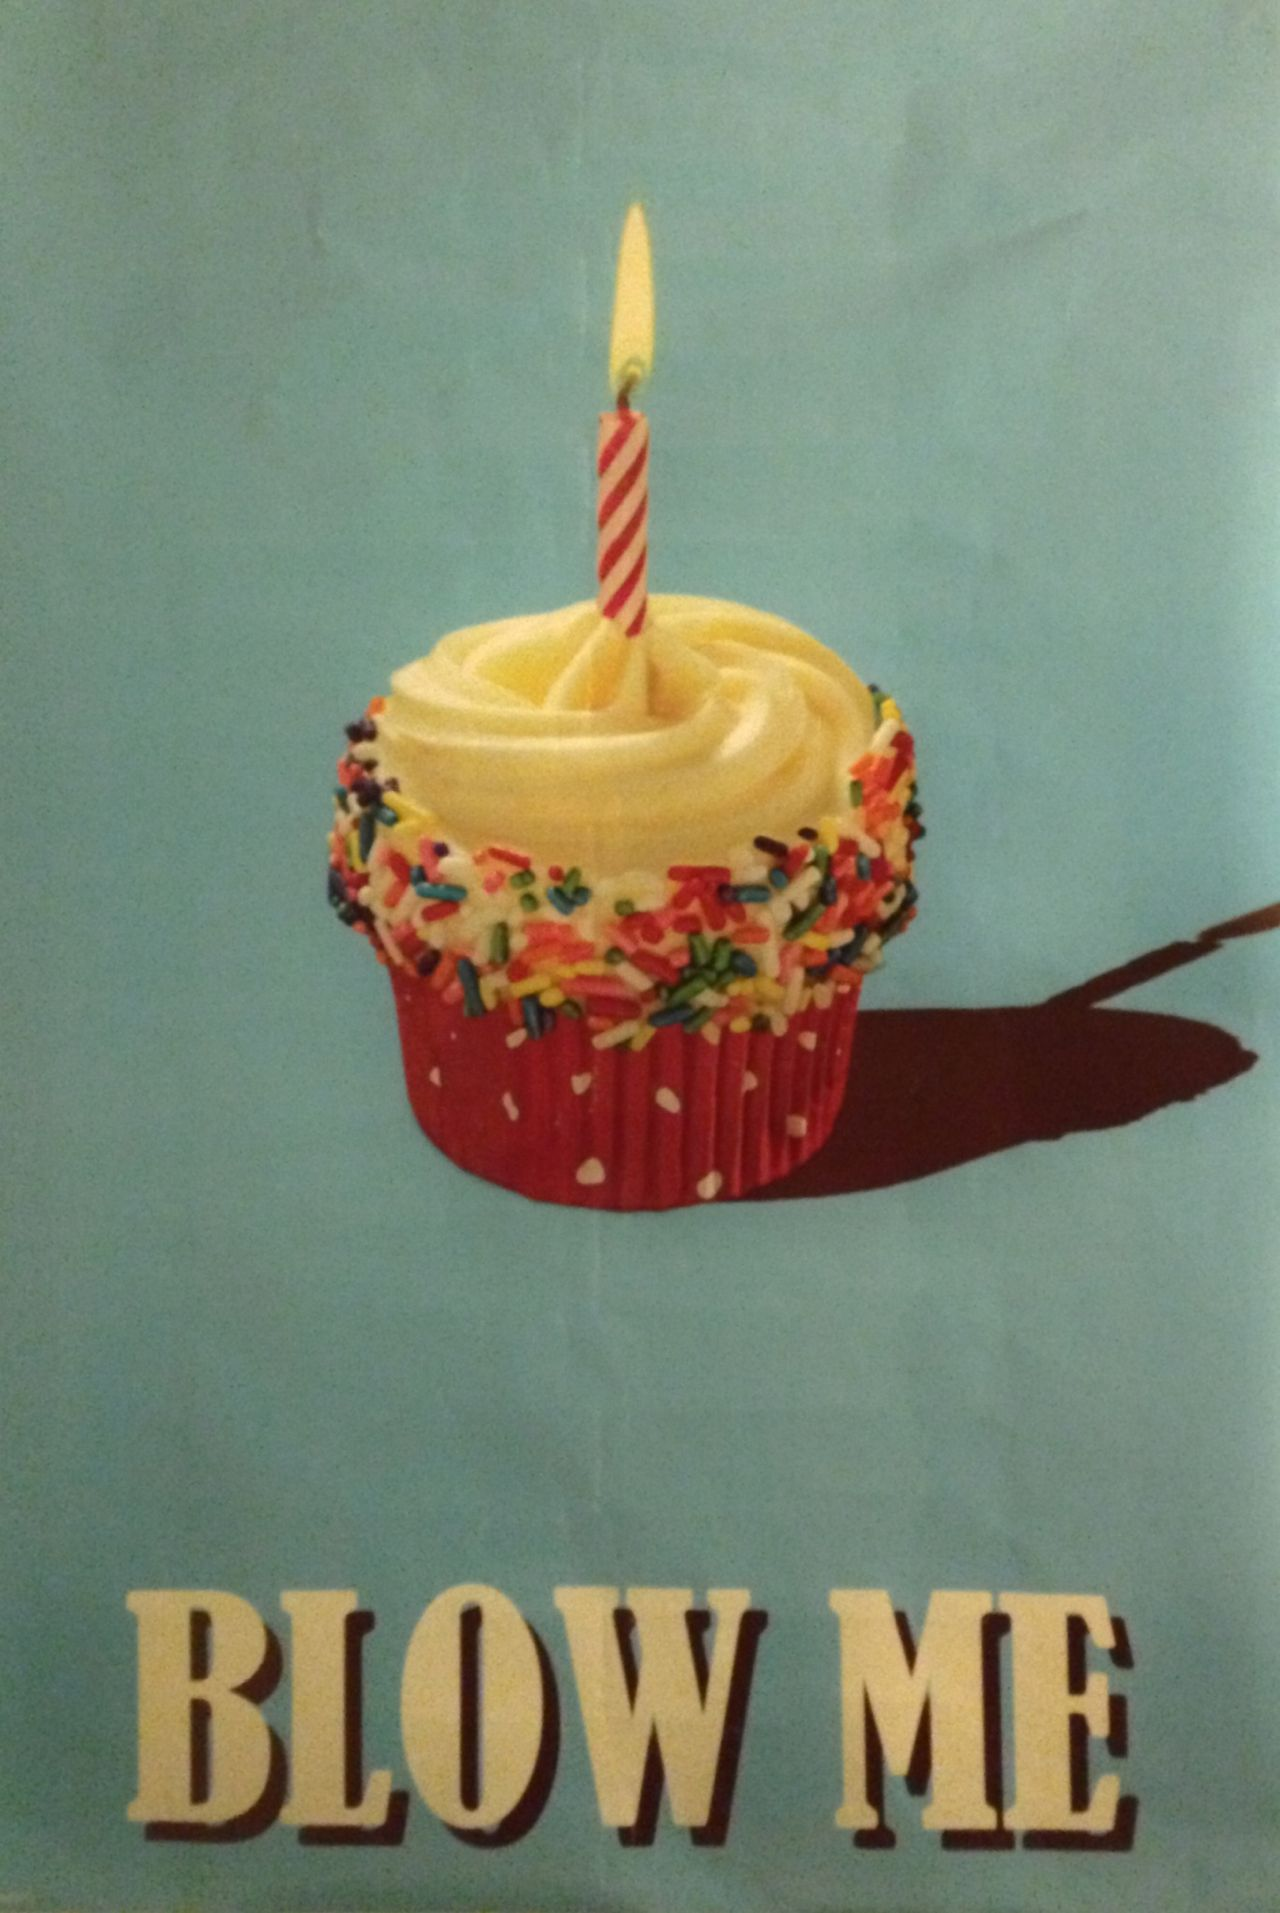 Pin by molly martinez on unordinary pinterest happy birthday